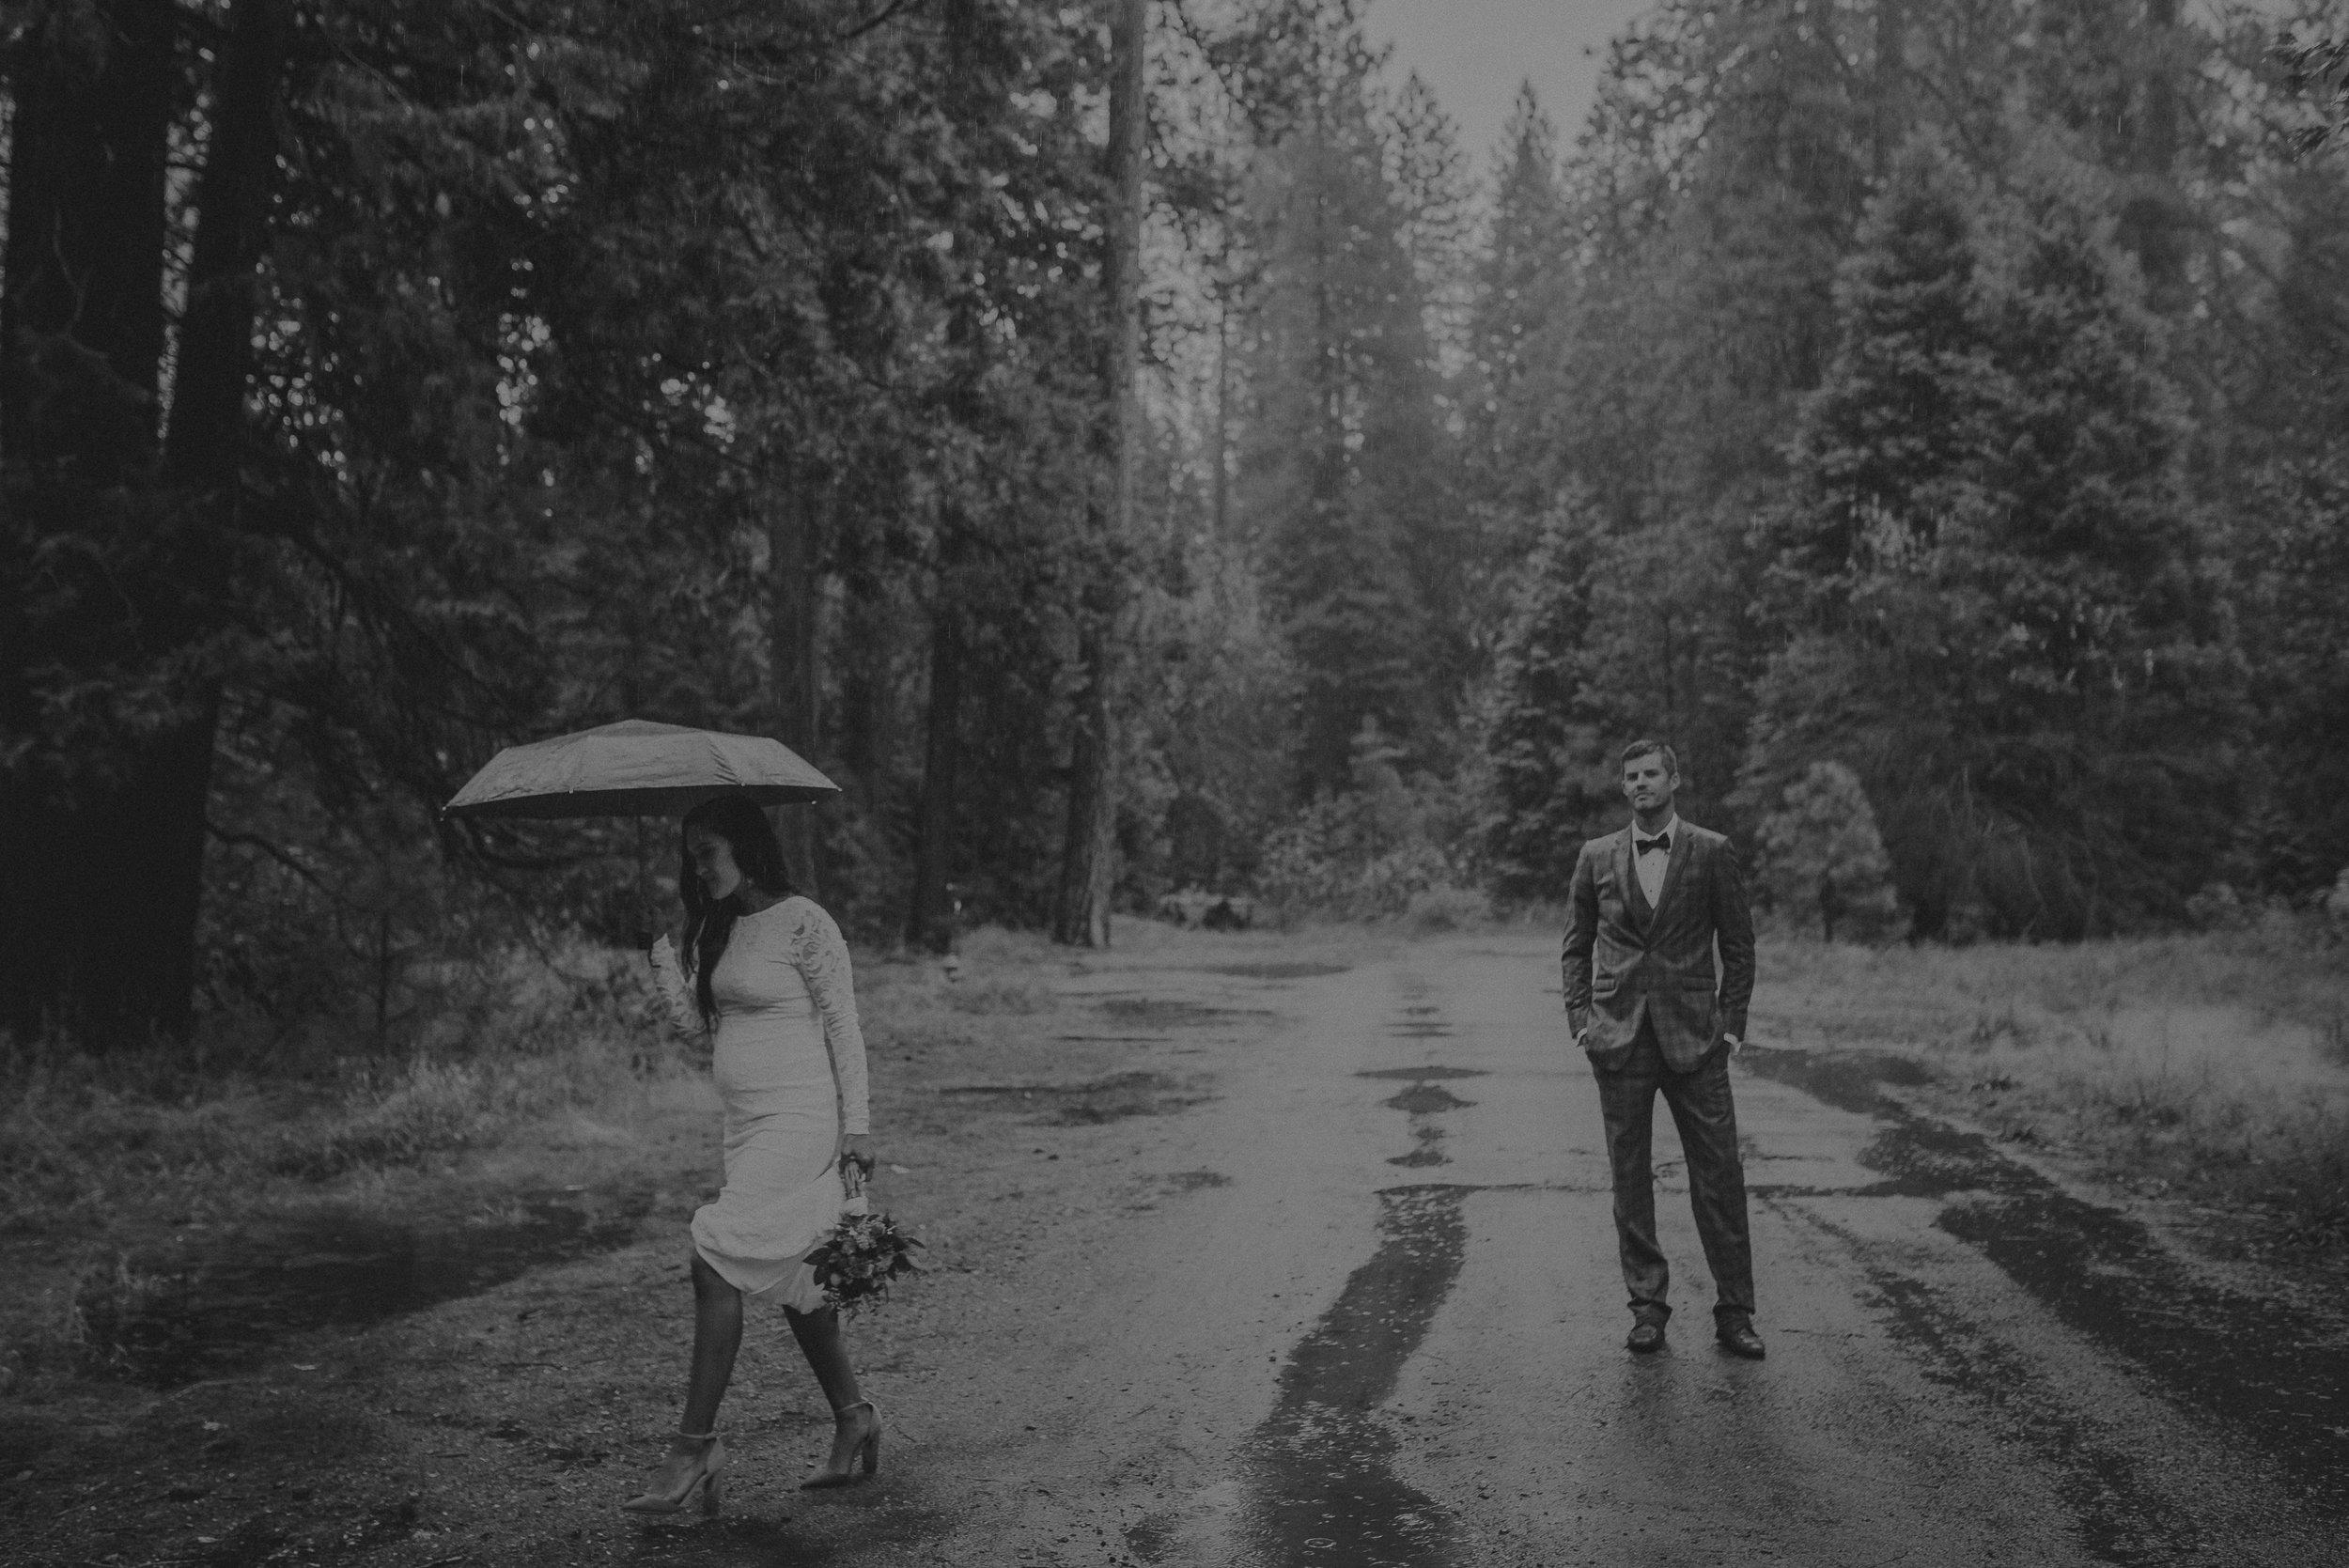 Isaiah + Taylor Photography - Yosemite Elopement - Los Angeles Wedding Photographer-22.jpg